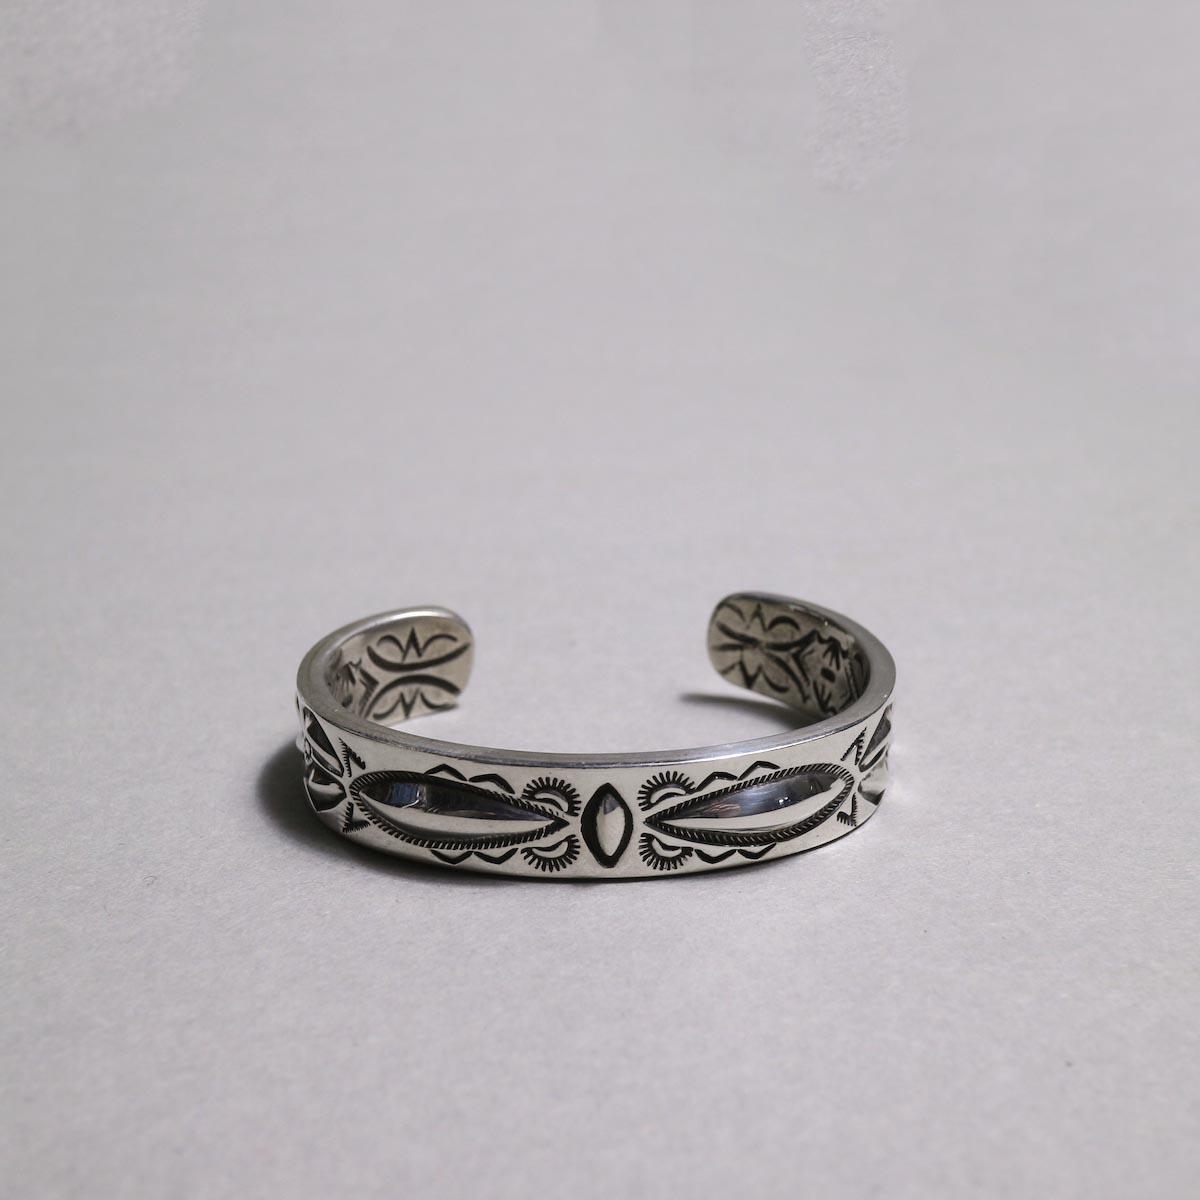 RAY ADAKAI / Double Stamp Bracelet (C)